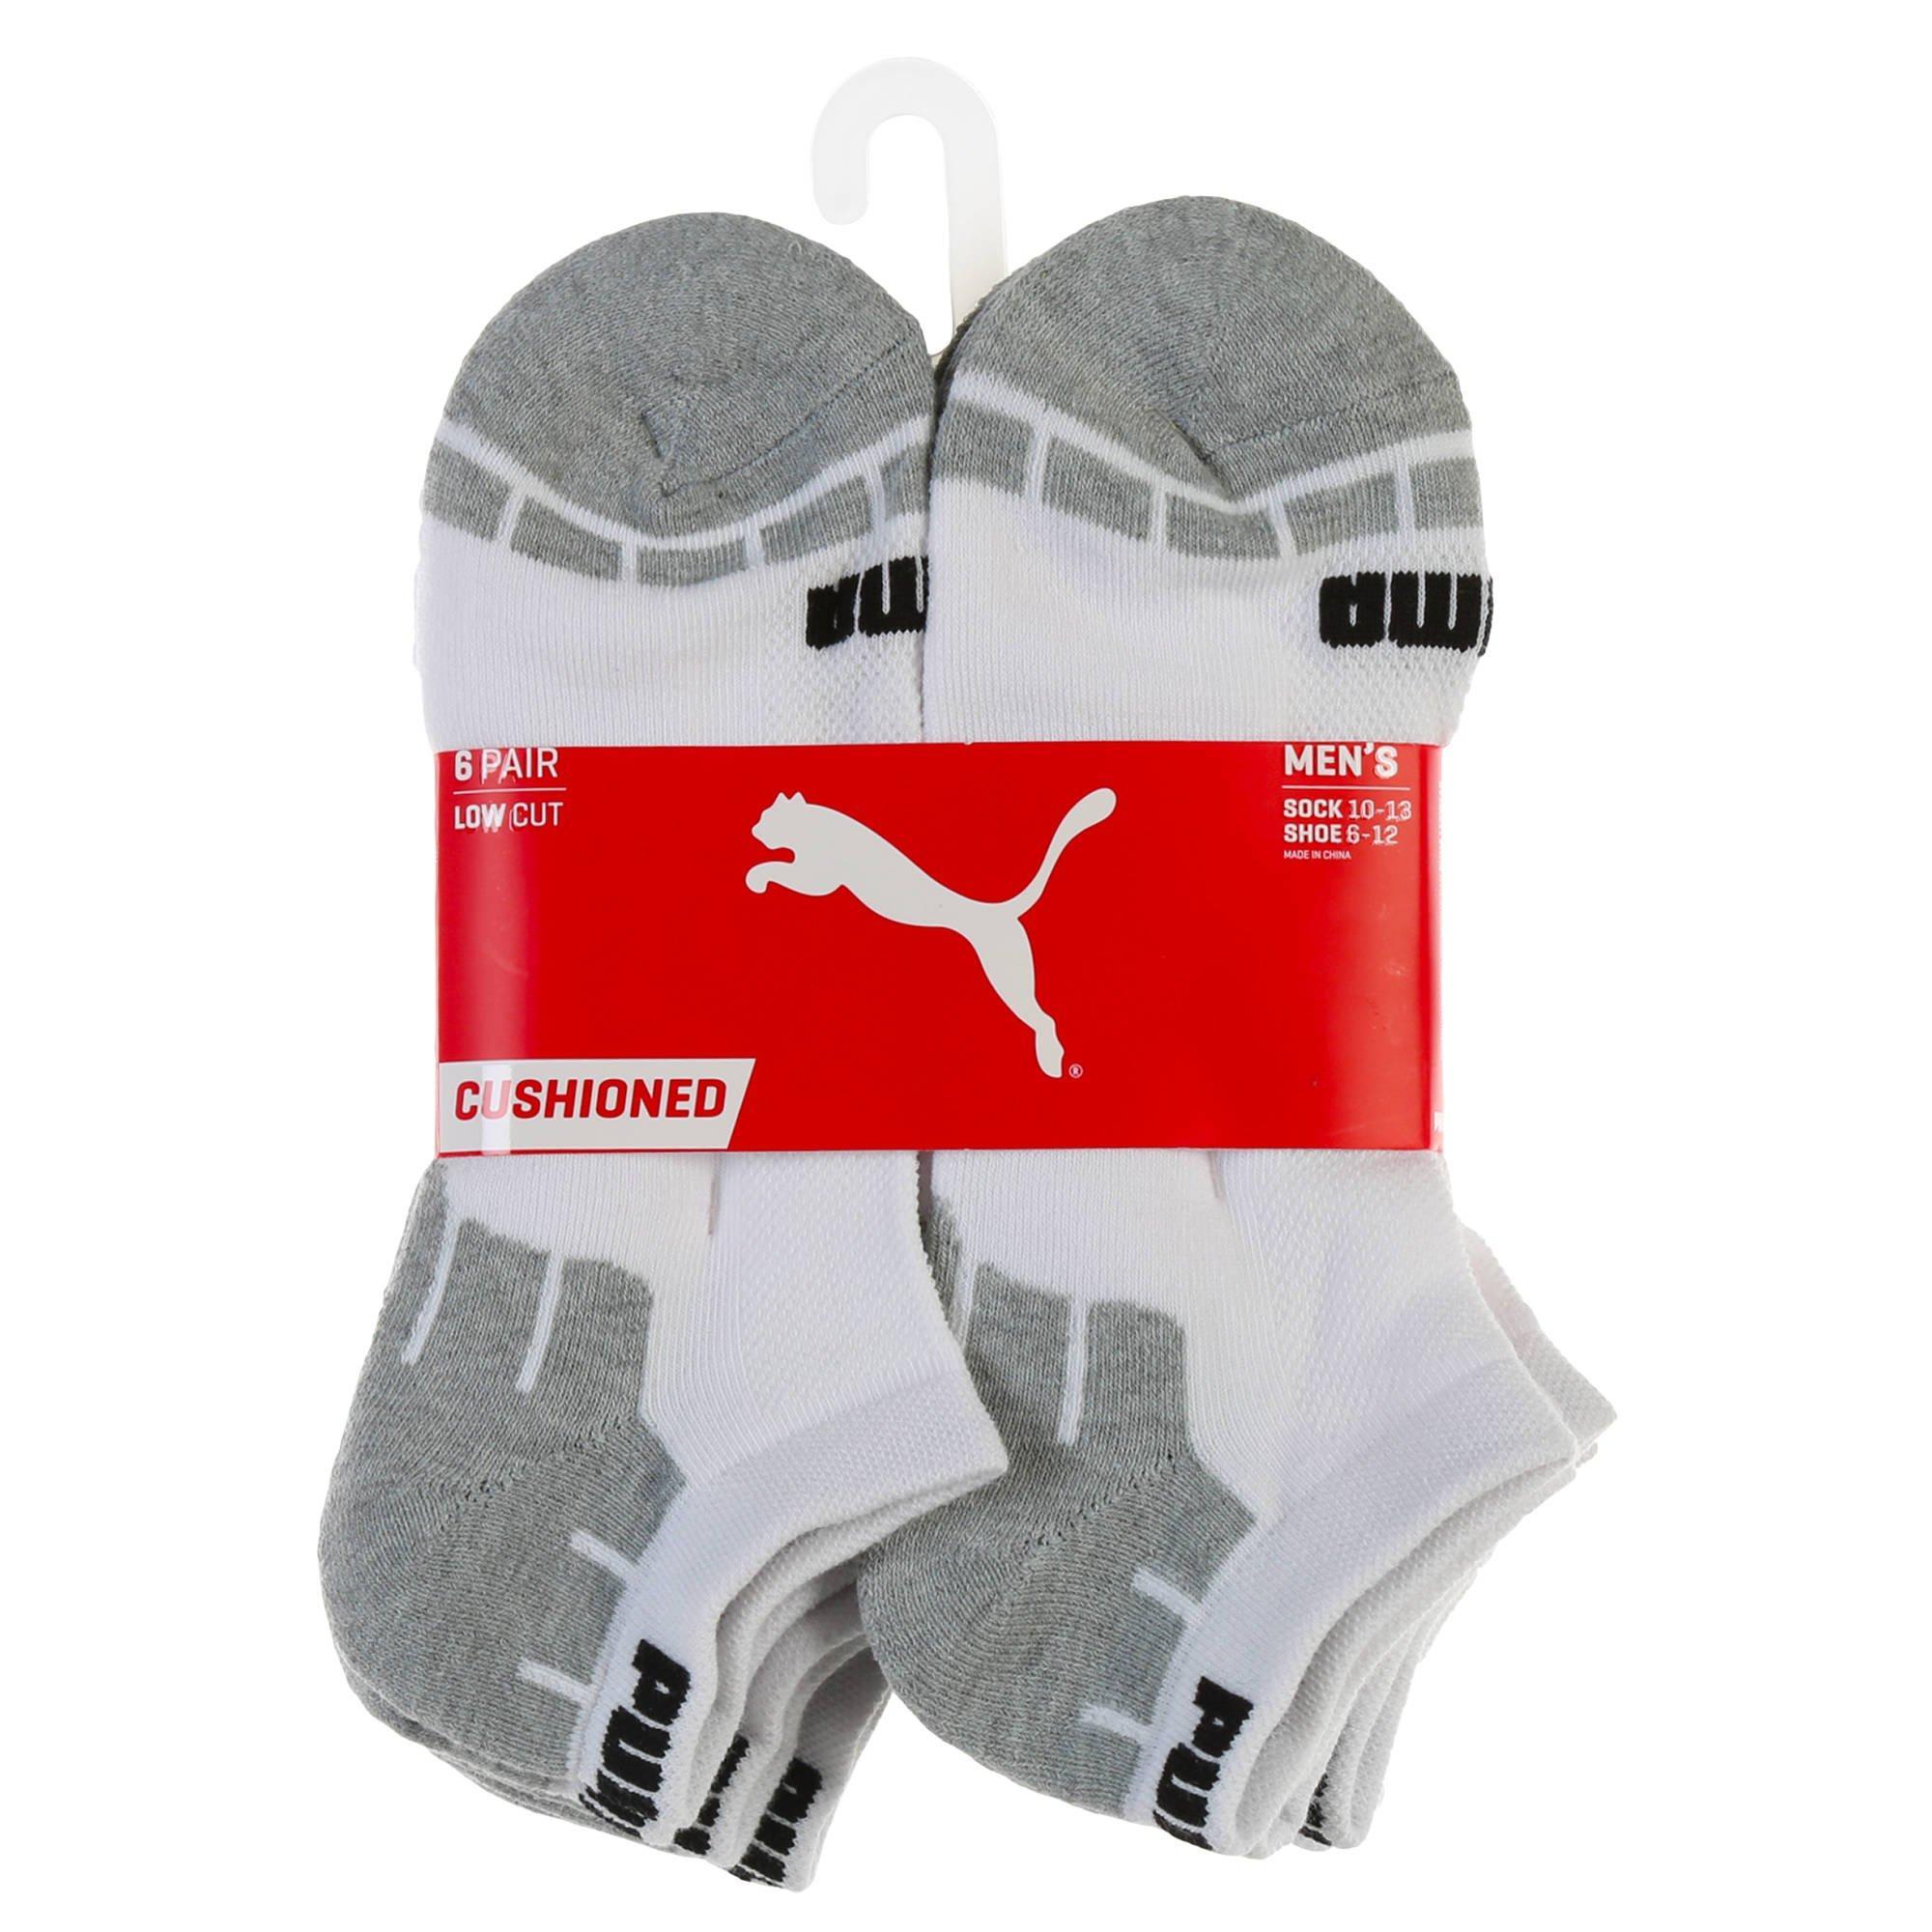 12 Pack Reebok Girls/' Lightweight Comfort Athletic Low Cut Socks